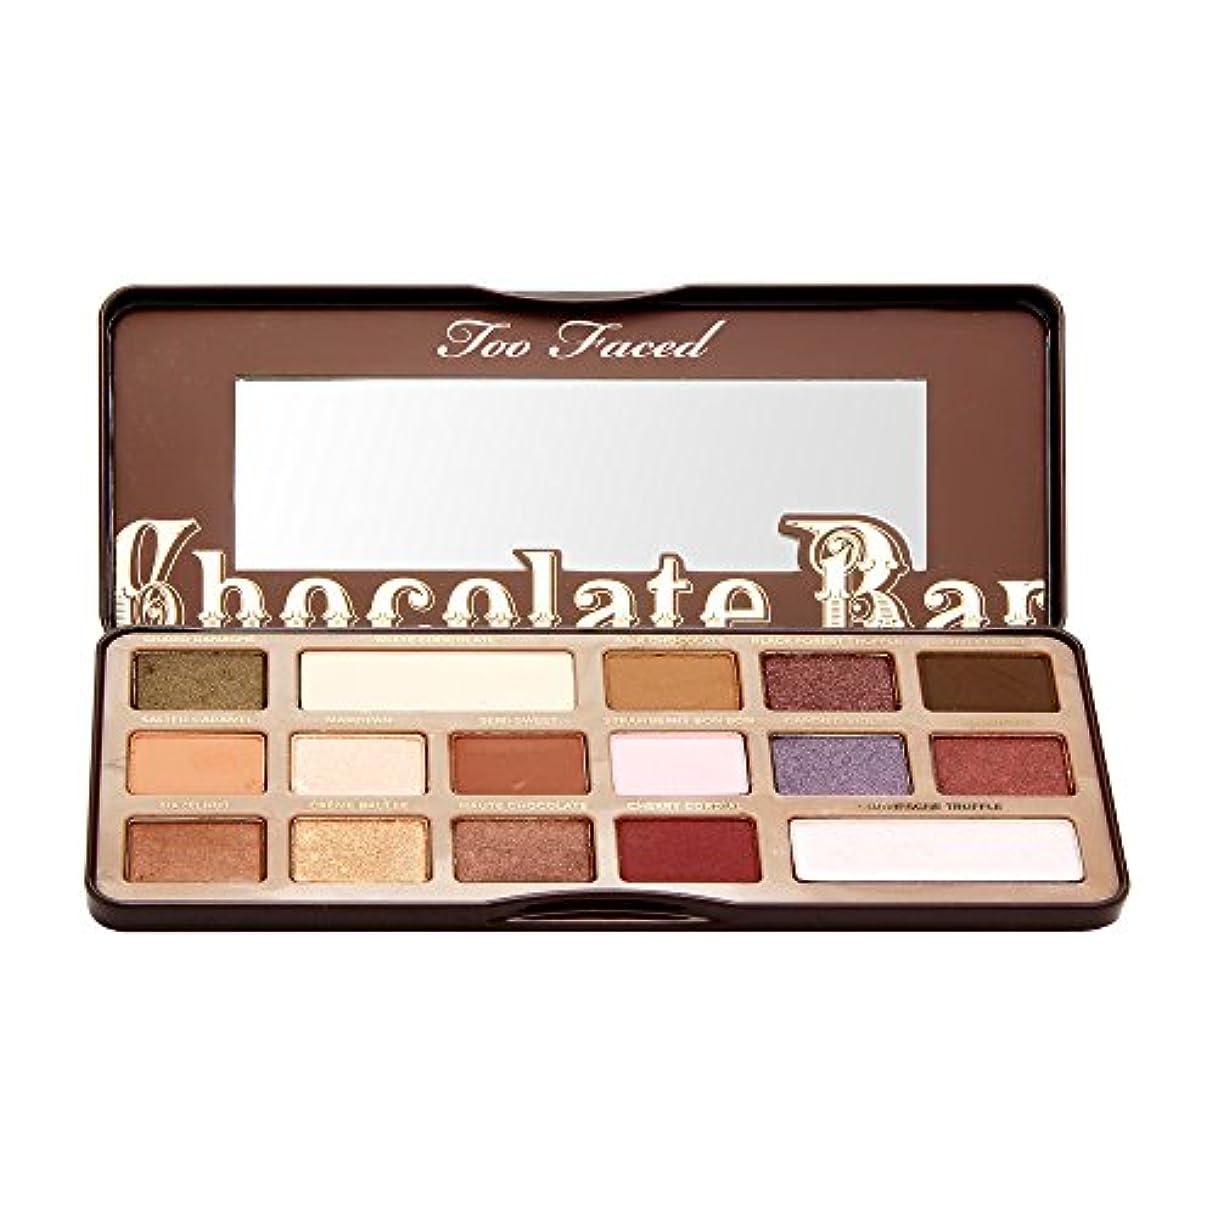 Too Faced Chocolate Bar Eye Shadow Collection (並行輸入品)